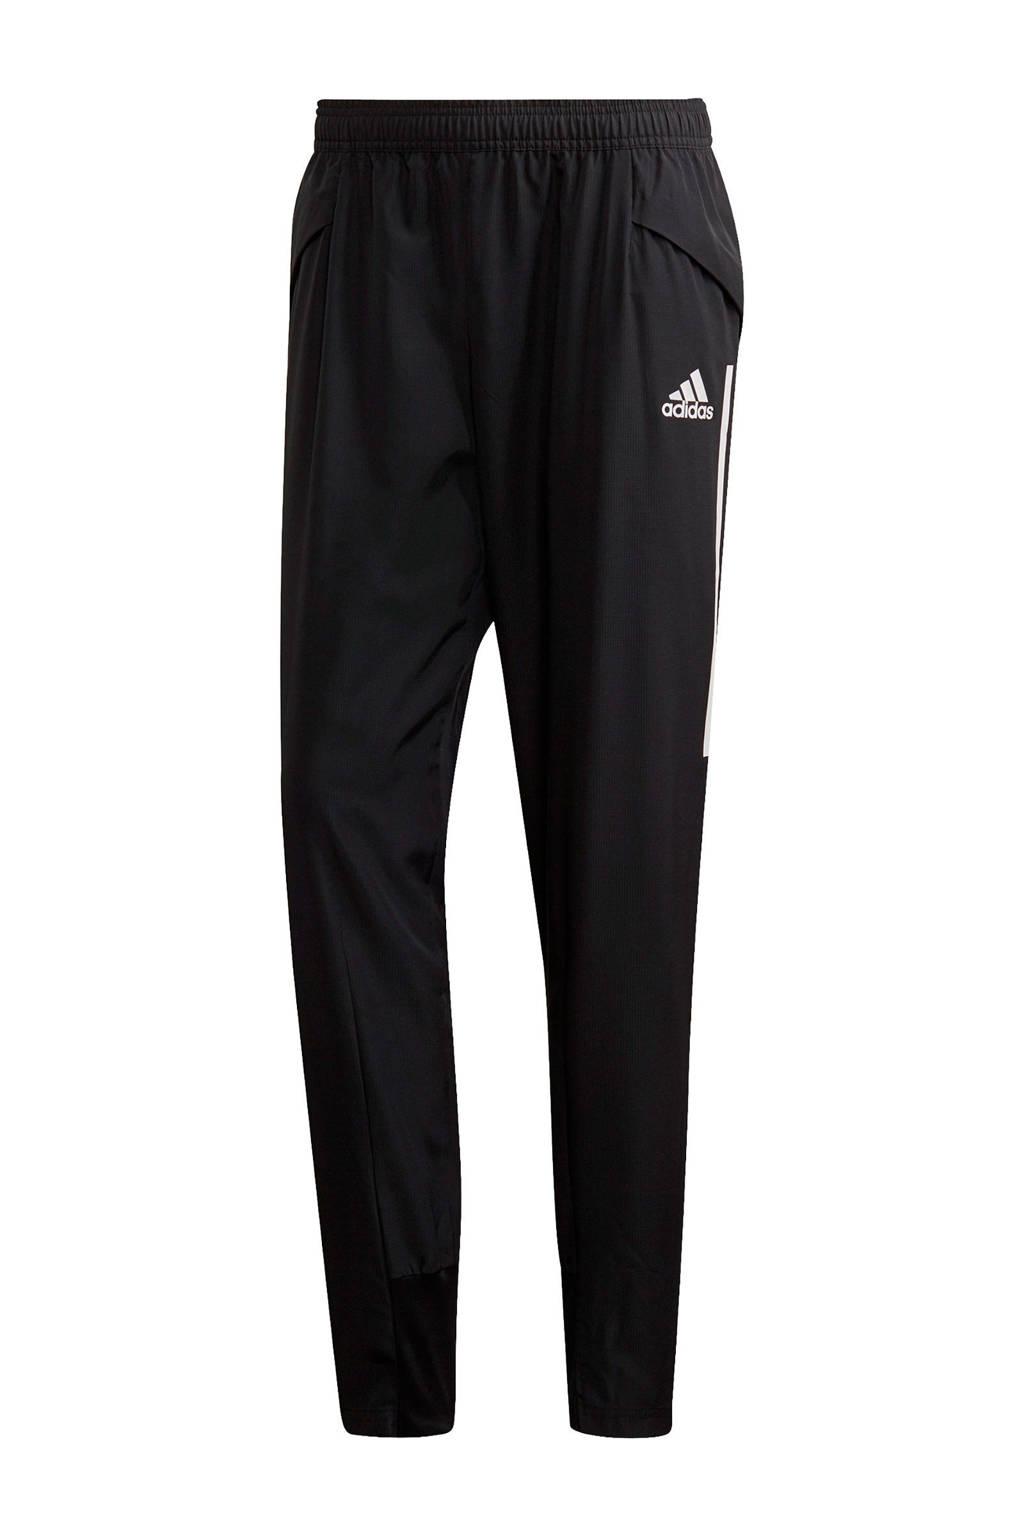 adidas Performance   sportbroek Condivo zwart, Zwart